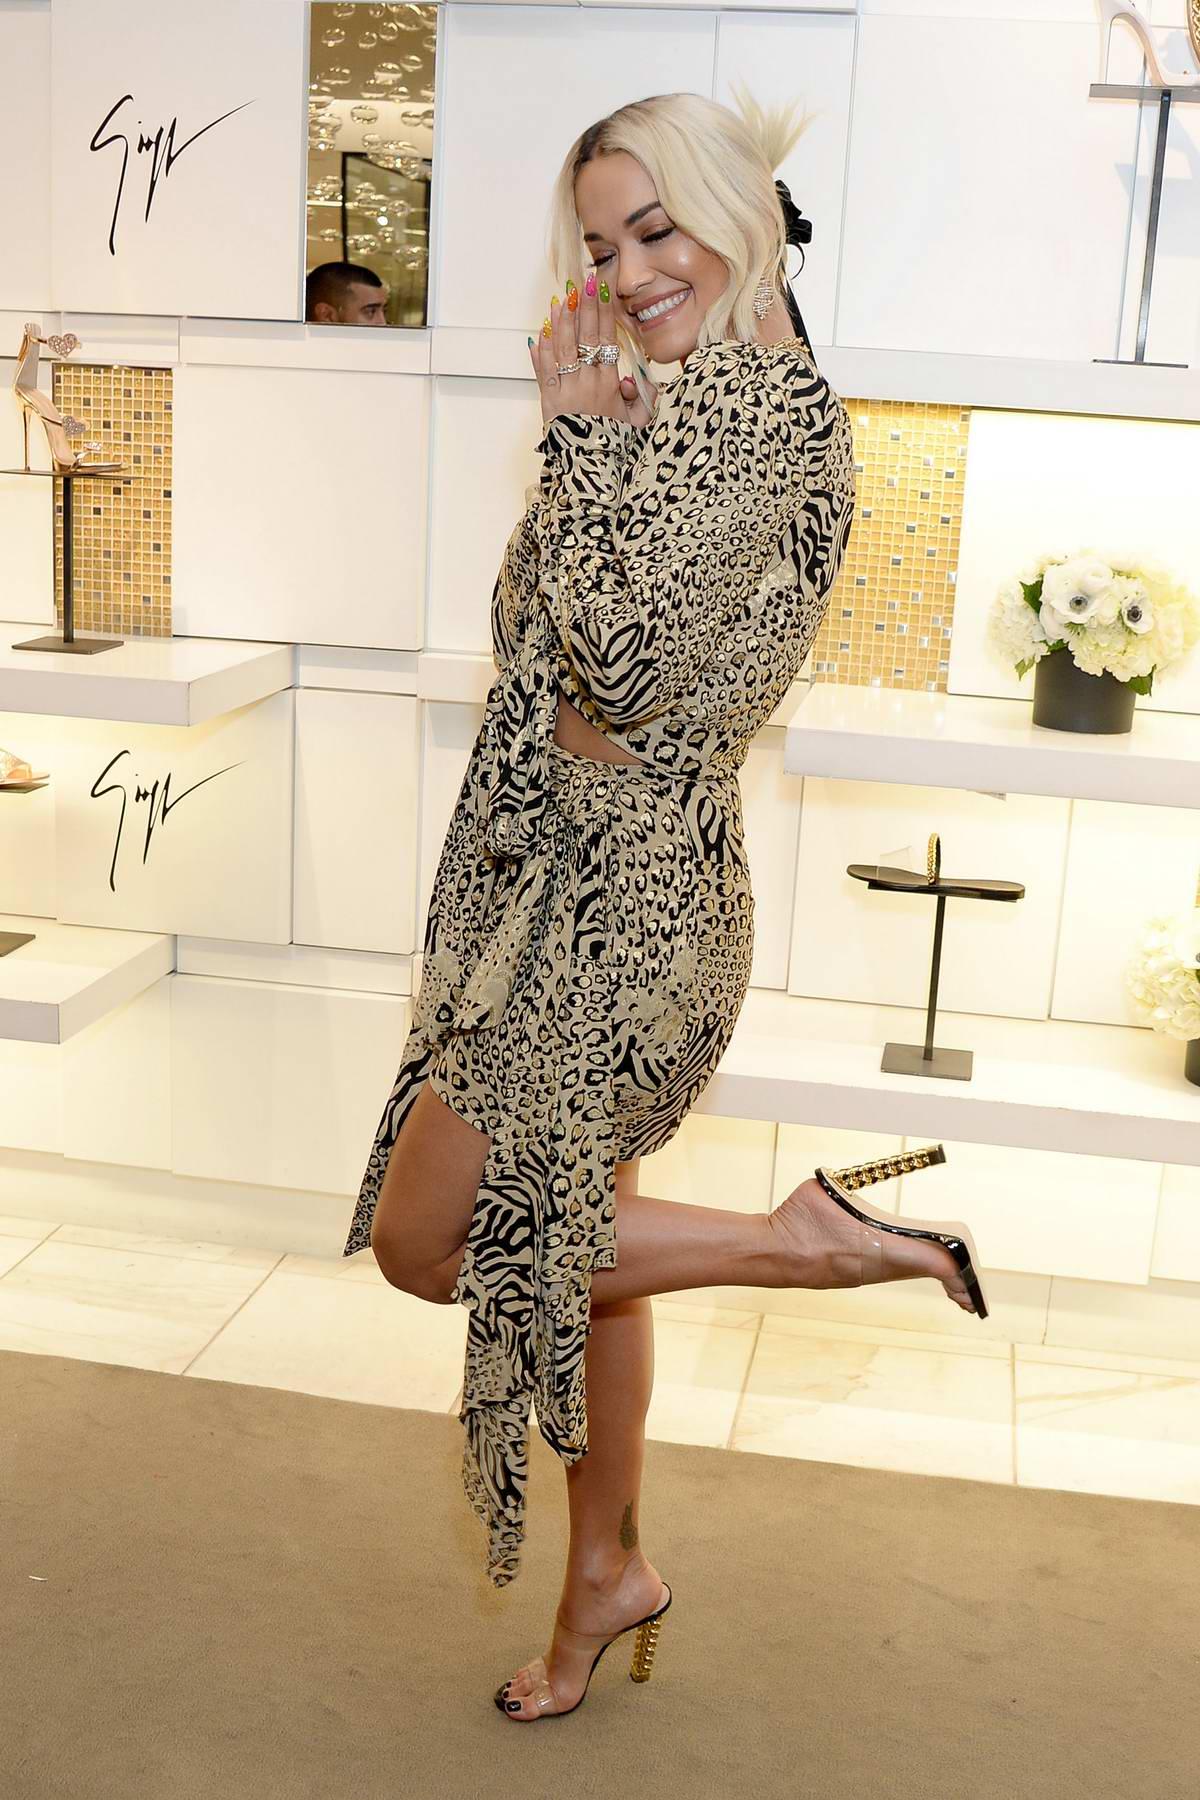 Rita Ora at the Giuseppe for Rita Ora Footwear Launch in Los Angeles